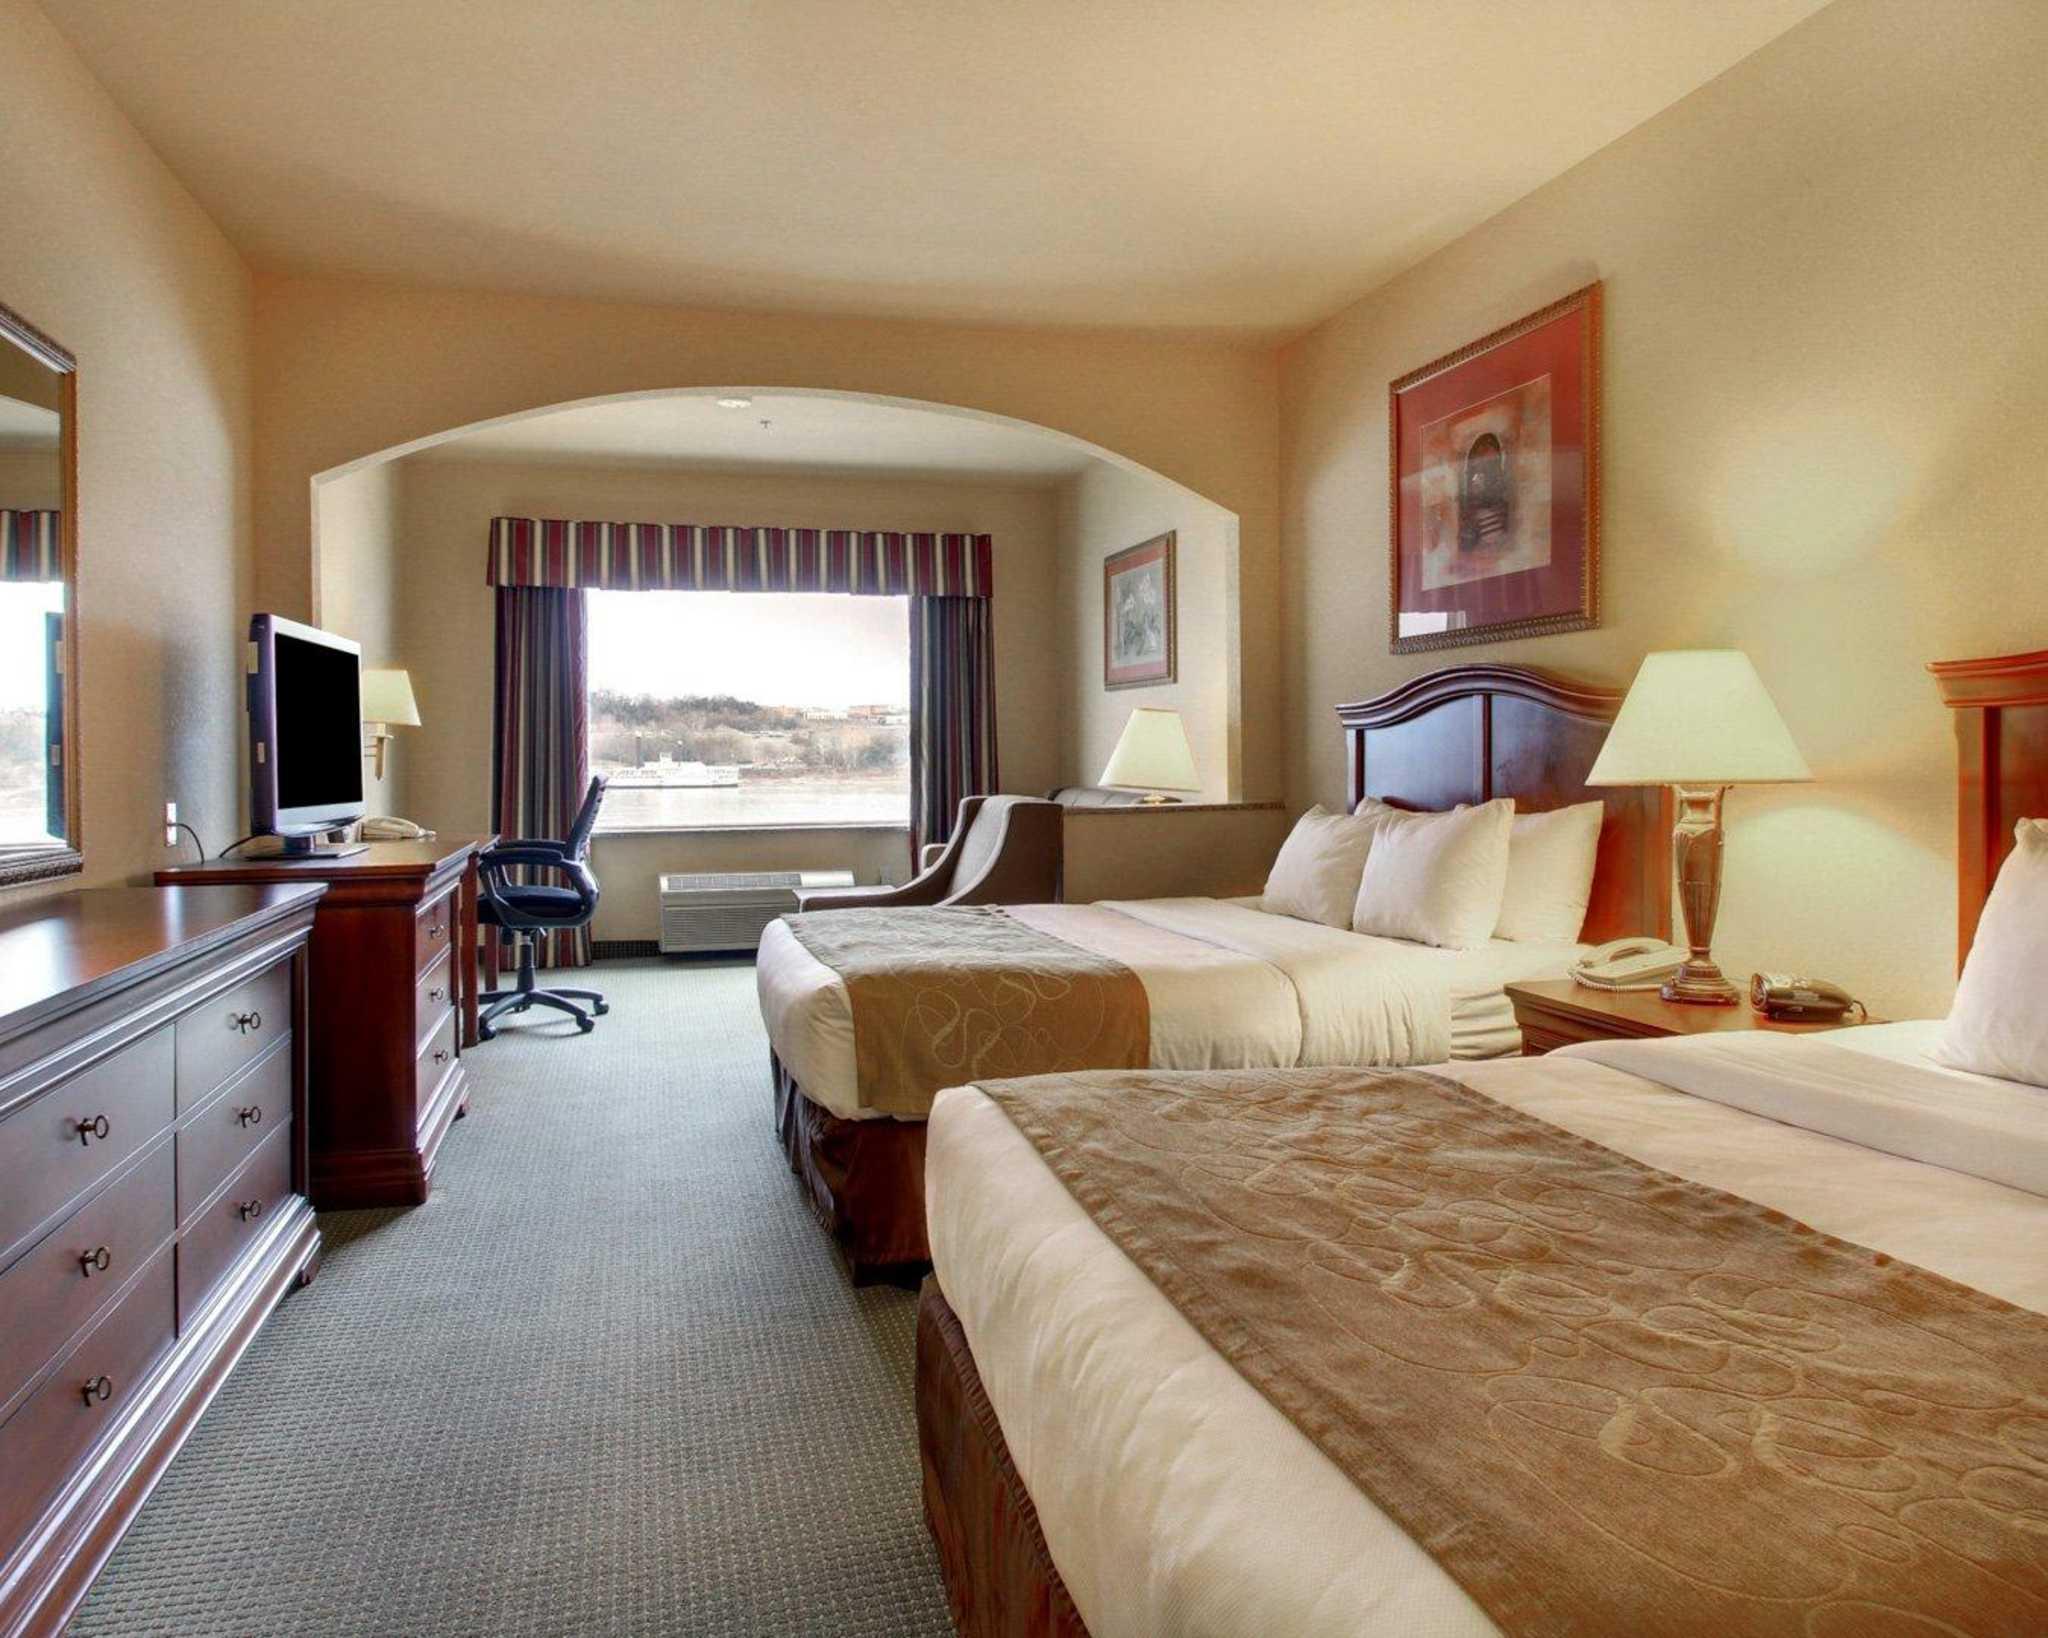 Comfort Suites image 24